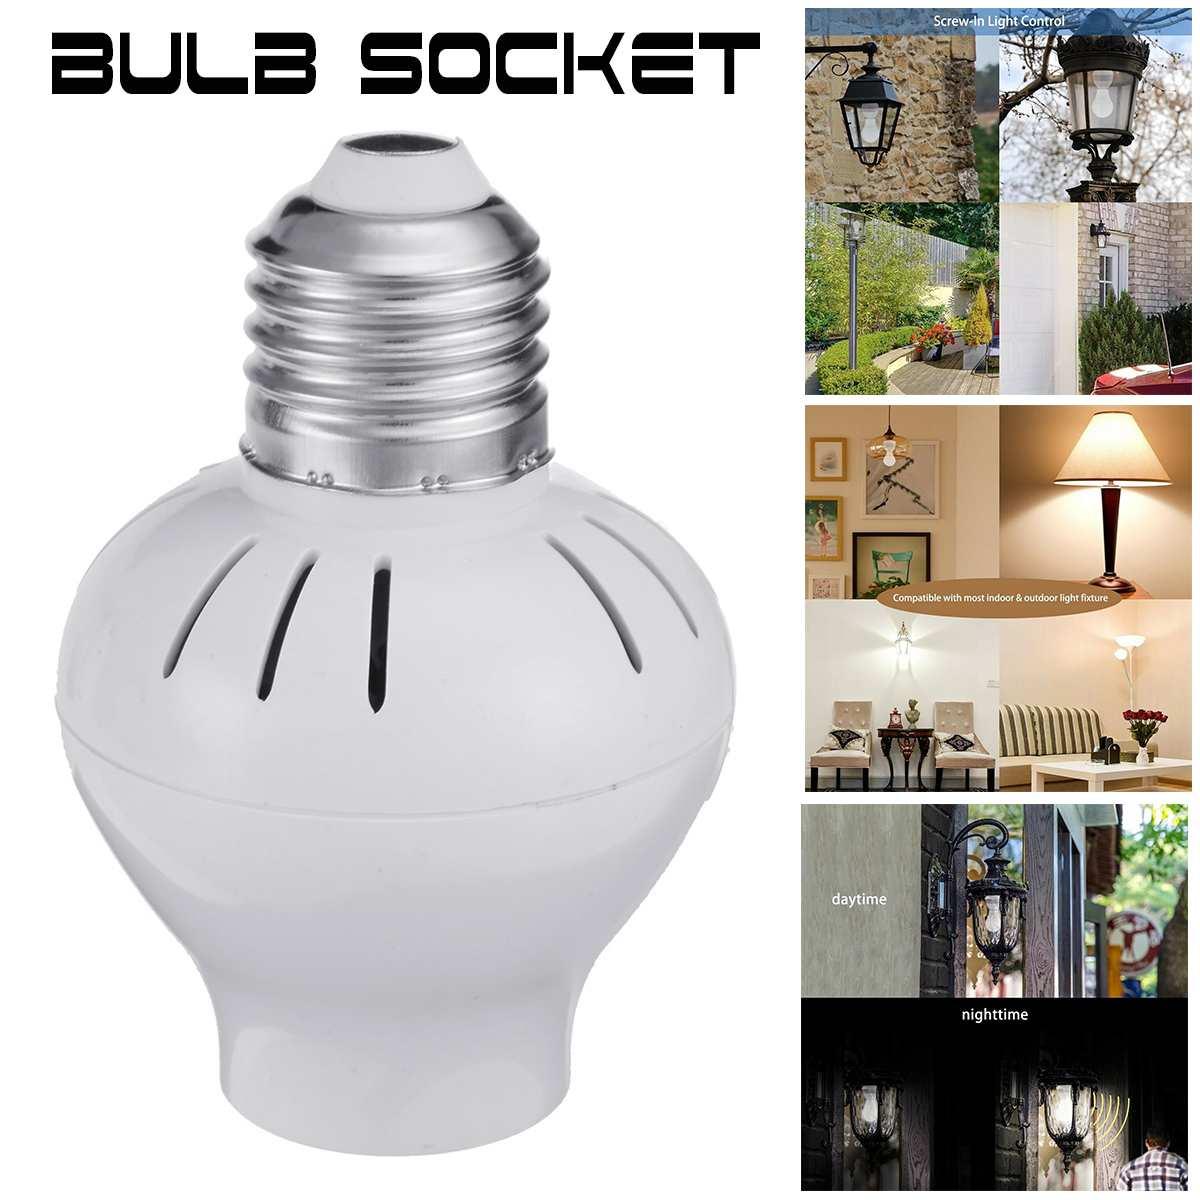 150W Universal E27 Auto Sensor Dusk To Dawn Photocell Light Control Screw In Night Light Bulb Socket 110V-240V